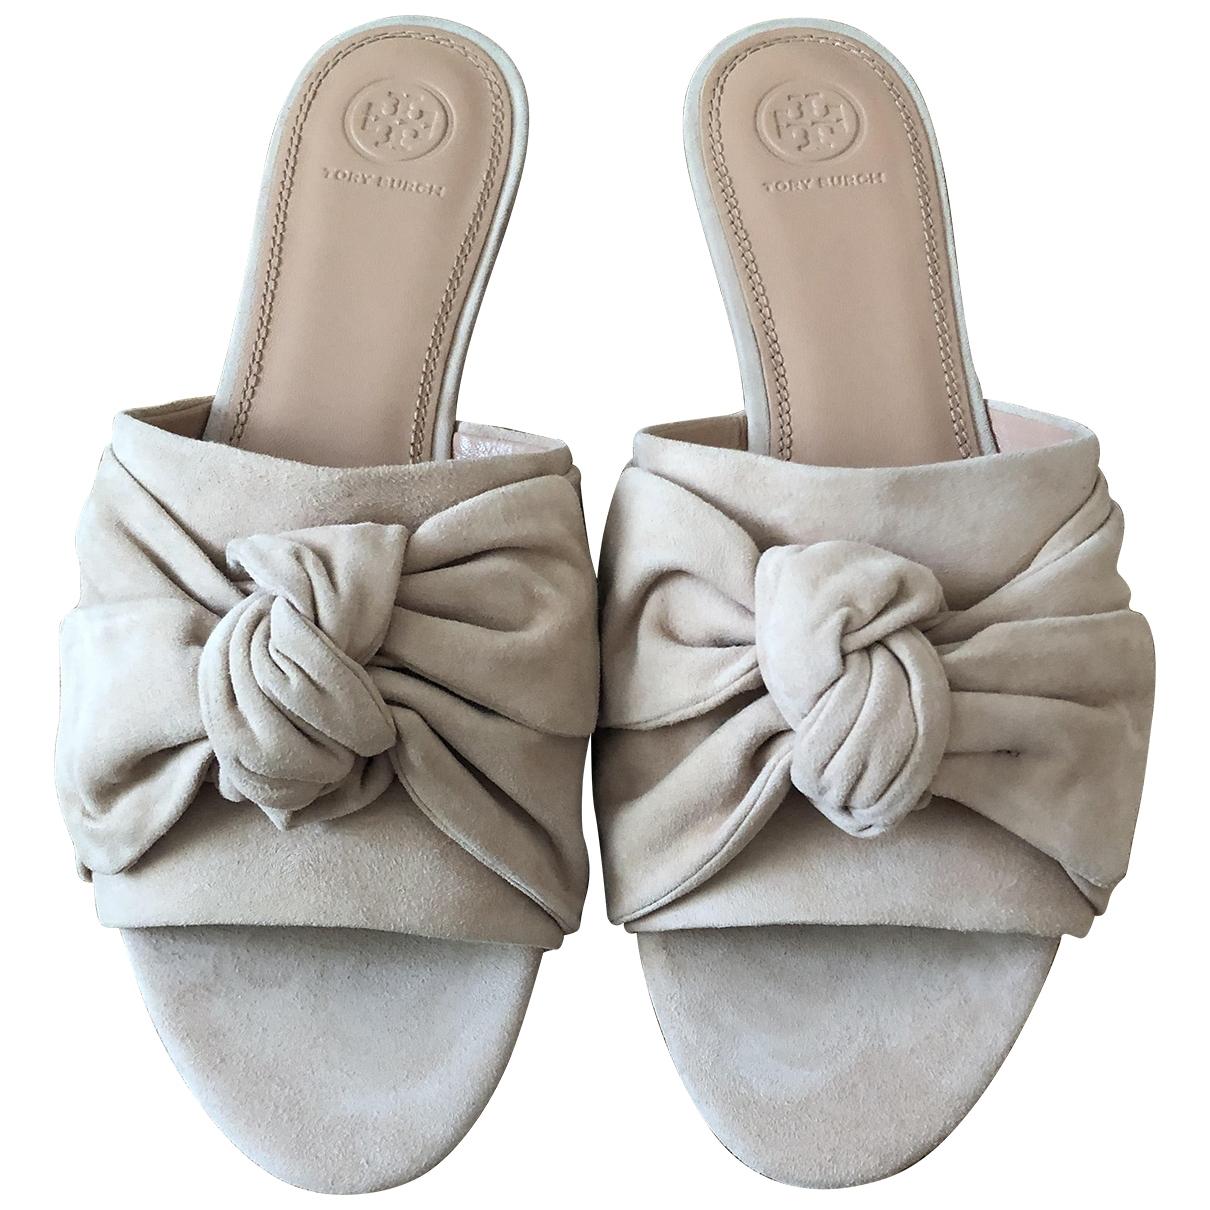 Tory Burch \N Beige Suede Sandals for Women 10 US